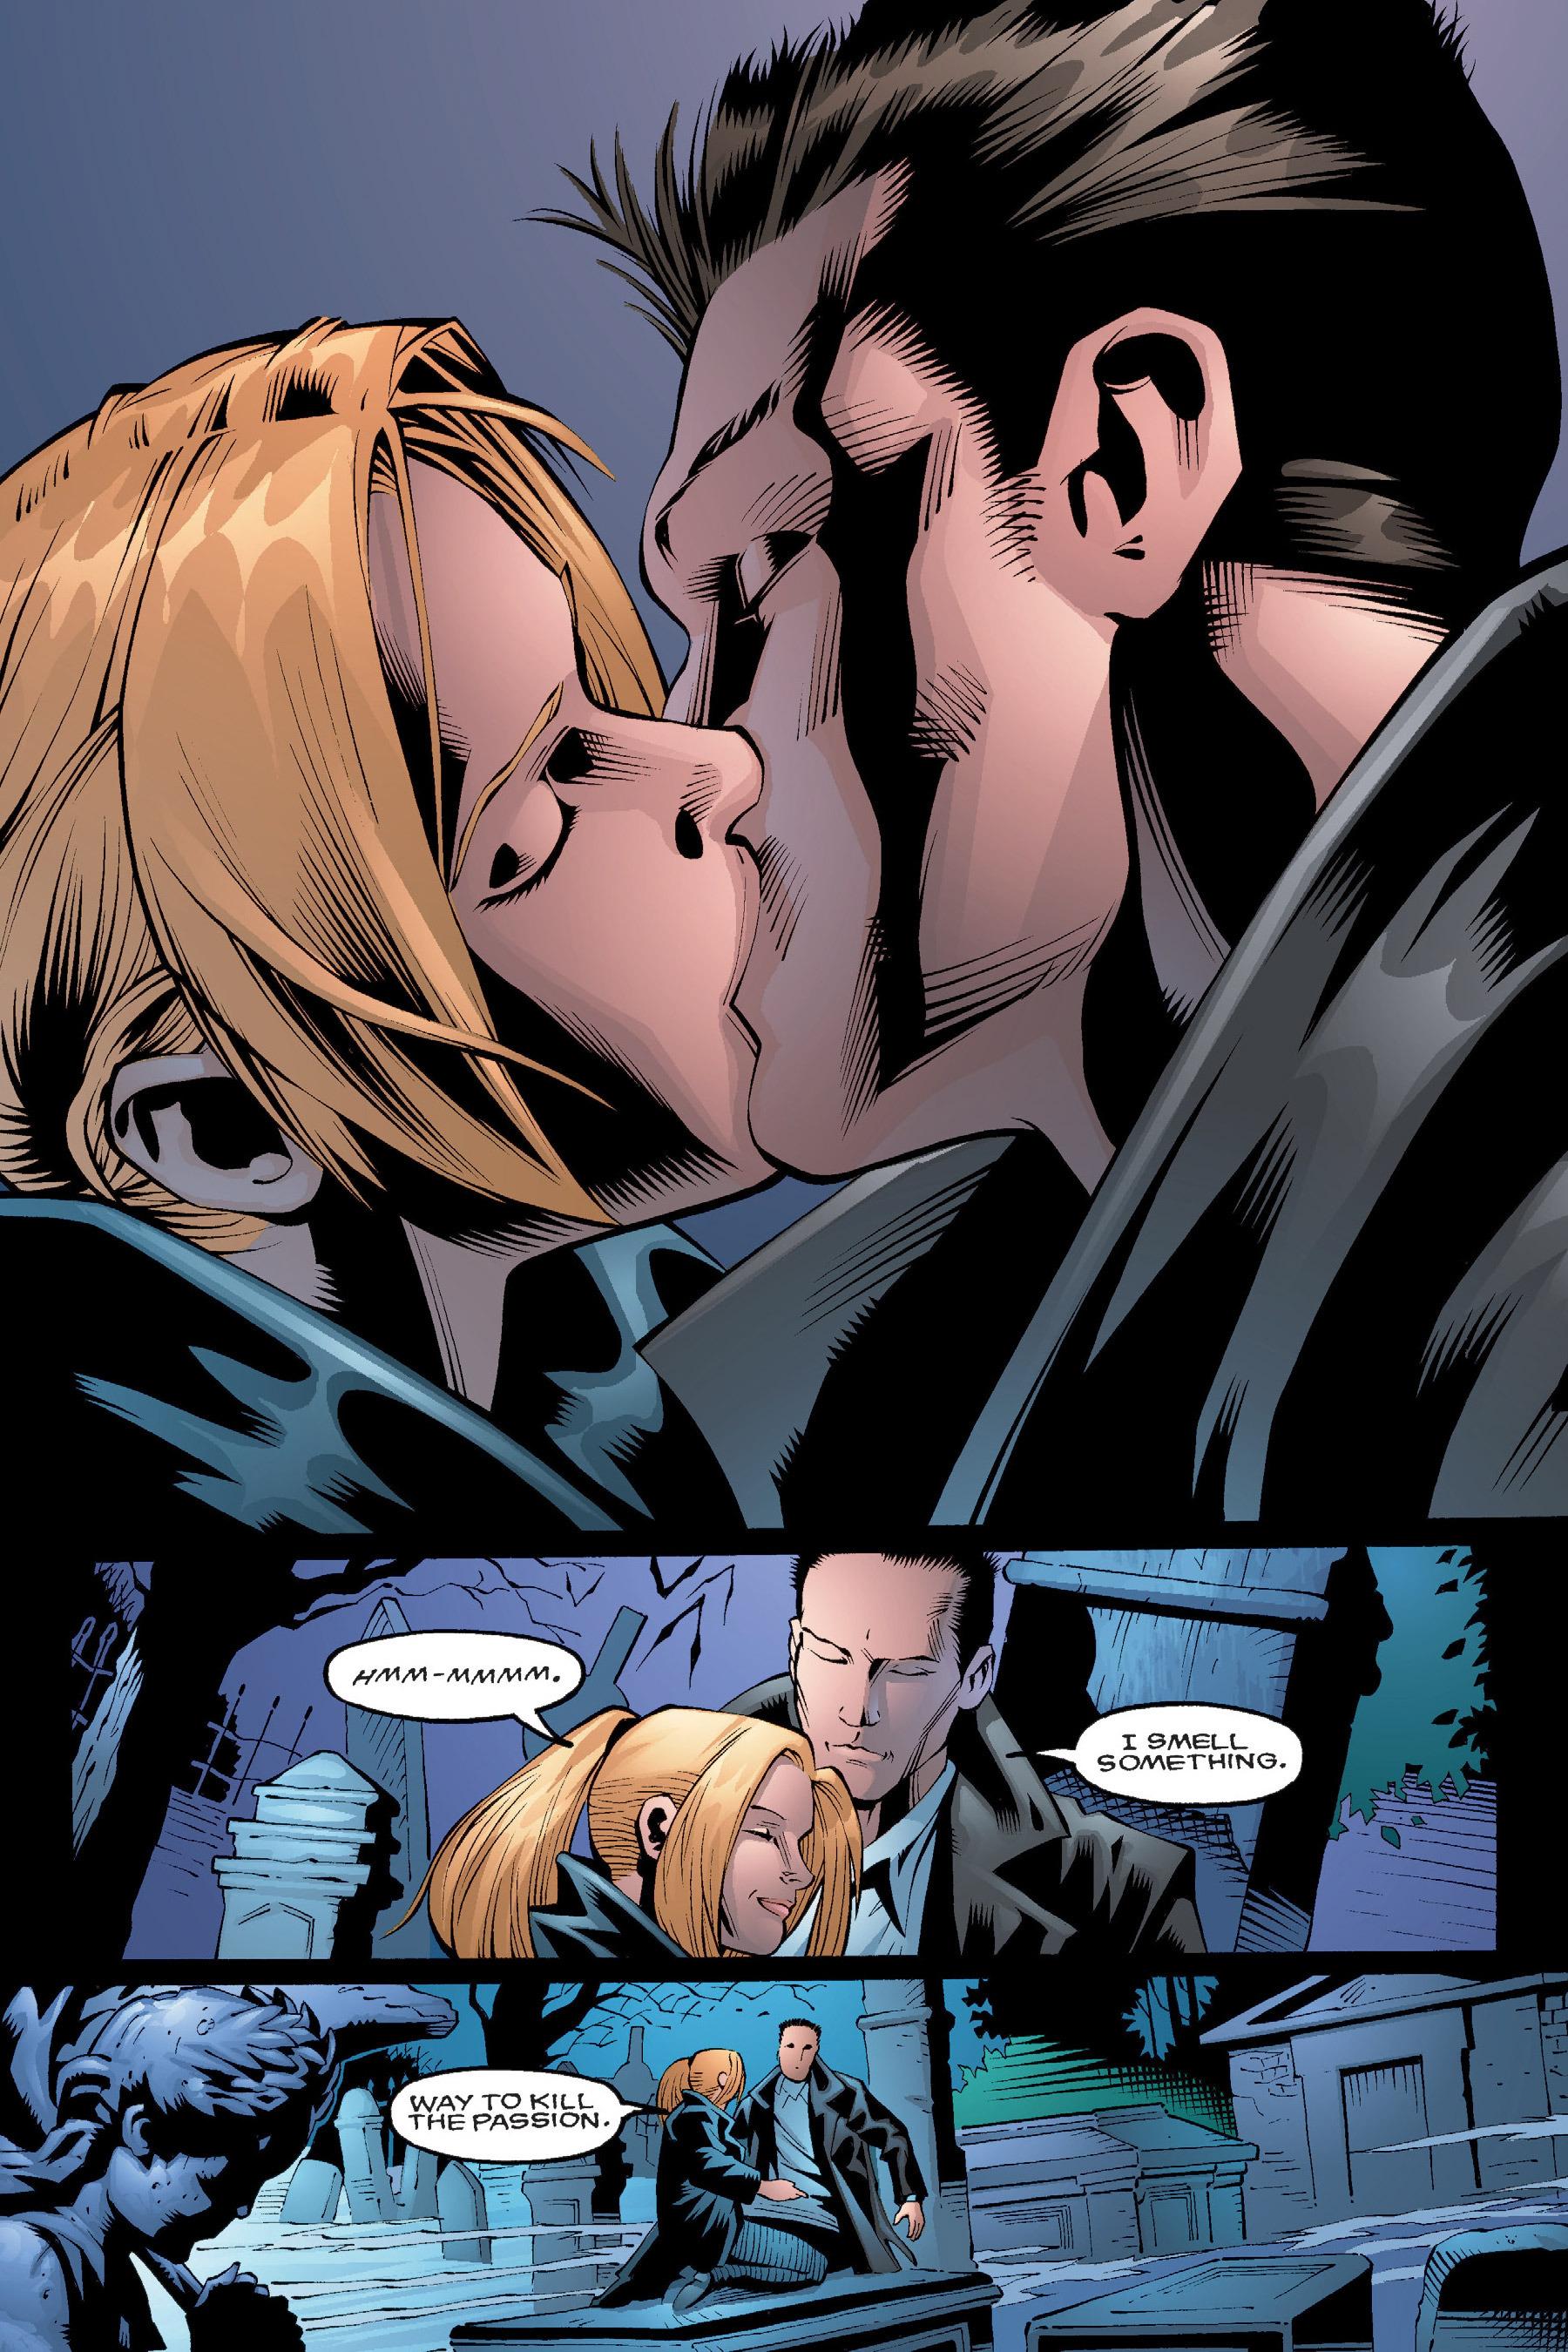 Read online Buffy the Vampire Slayer: Omnibus comic -  Issue # TPB 4 - 10